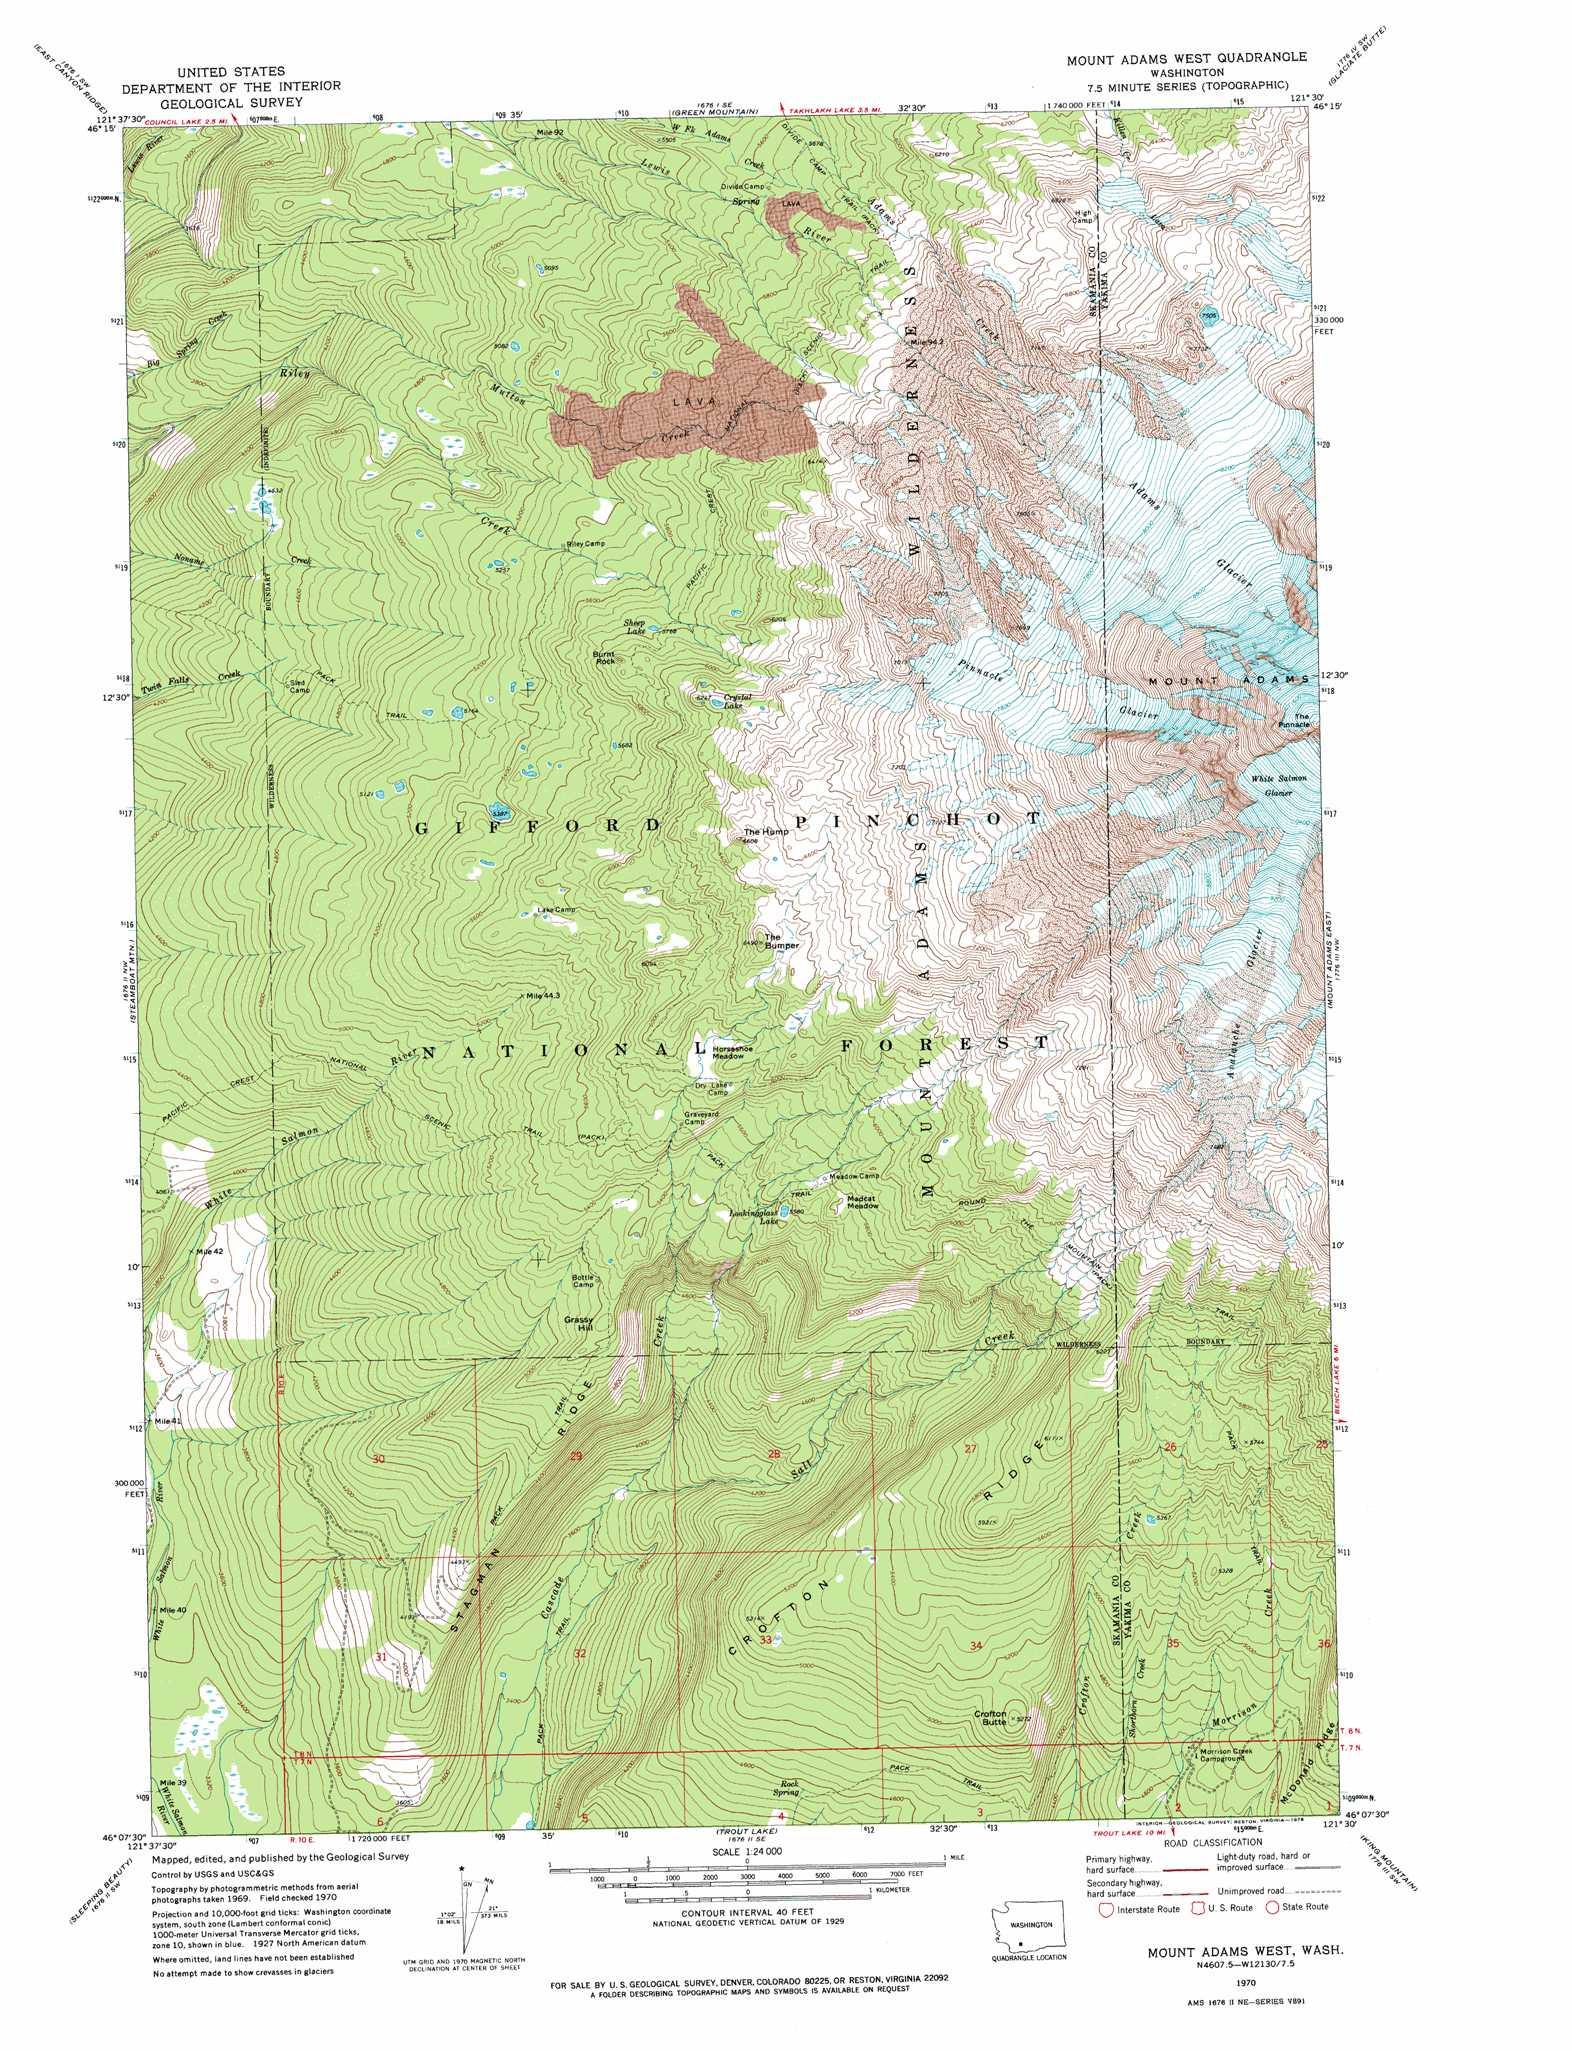 Mt Adams Washington Map.Mount Adams West Topographic Map Wa Usgs Topo Quad 46121b5